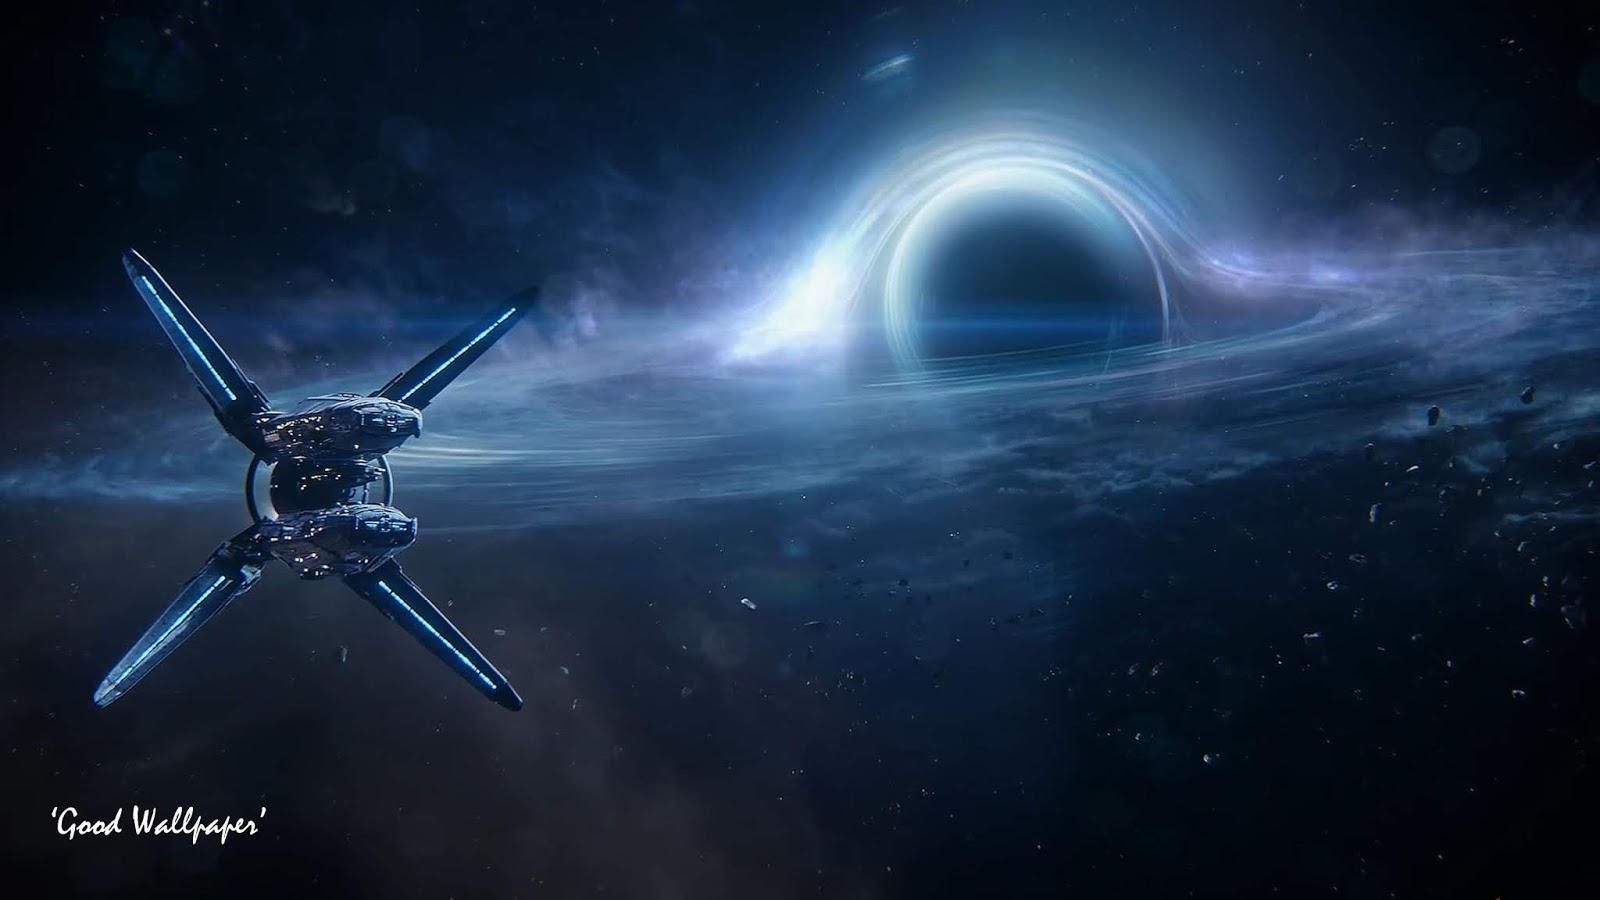 3d Mass Effect Andromeda Wallpaper Full Hd 4k 1920x1080 Amazing